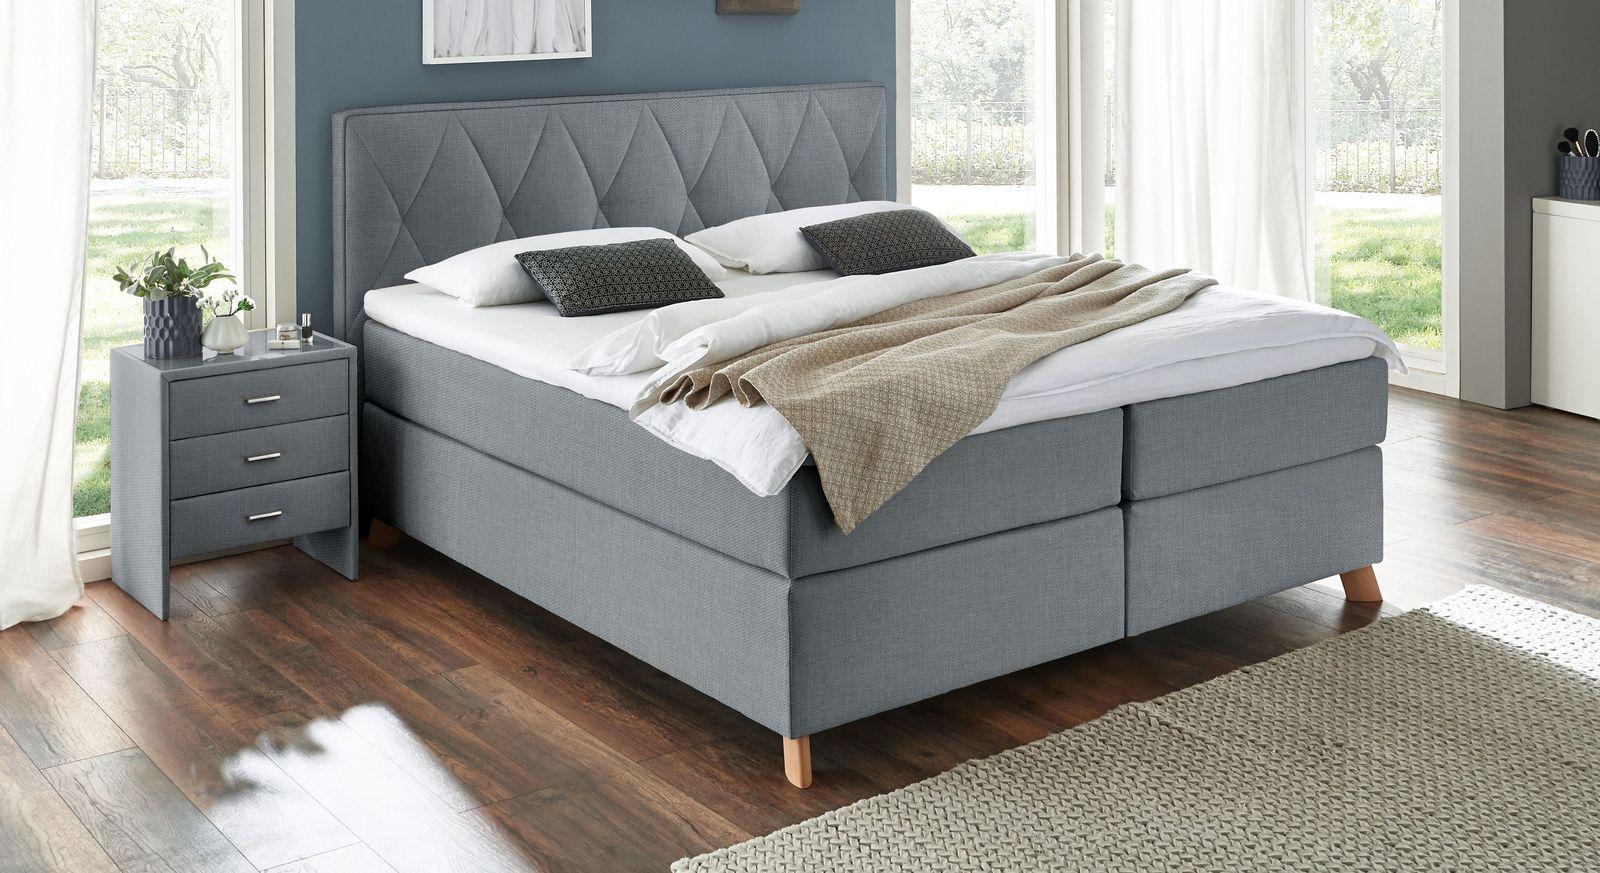 boxspringbett mit topper und gestepptem kopfteil allentown. Black Bedroom Furniture Sets. Home Design Ideas